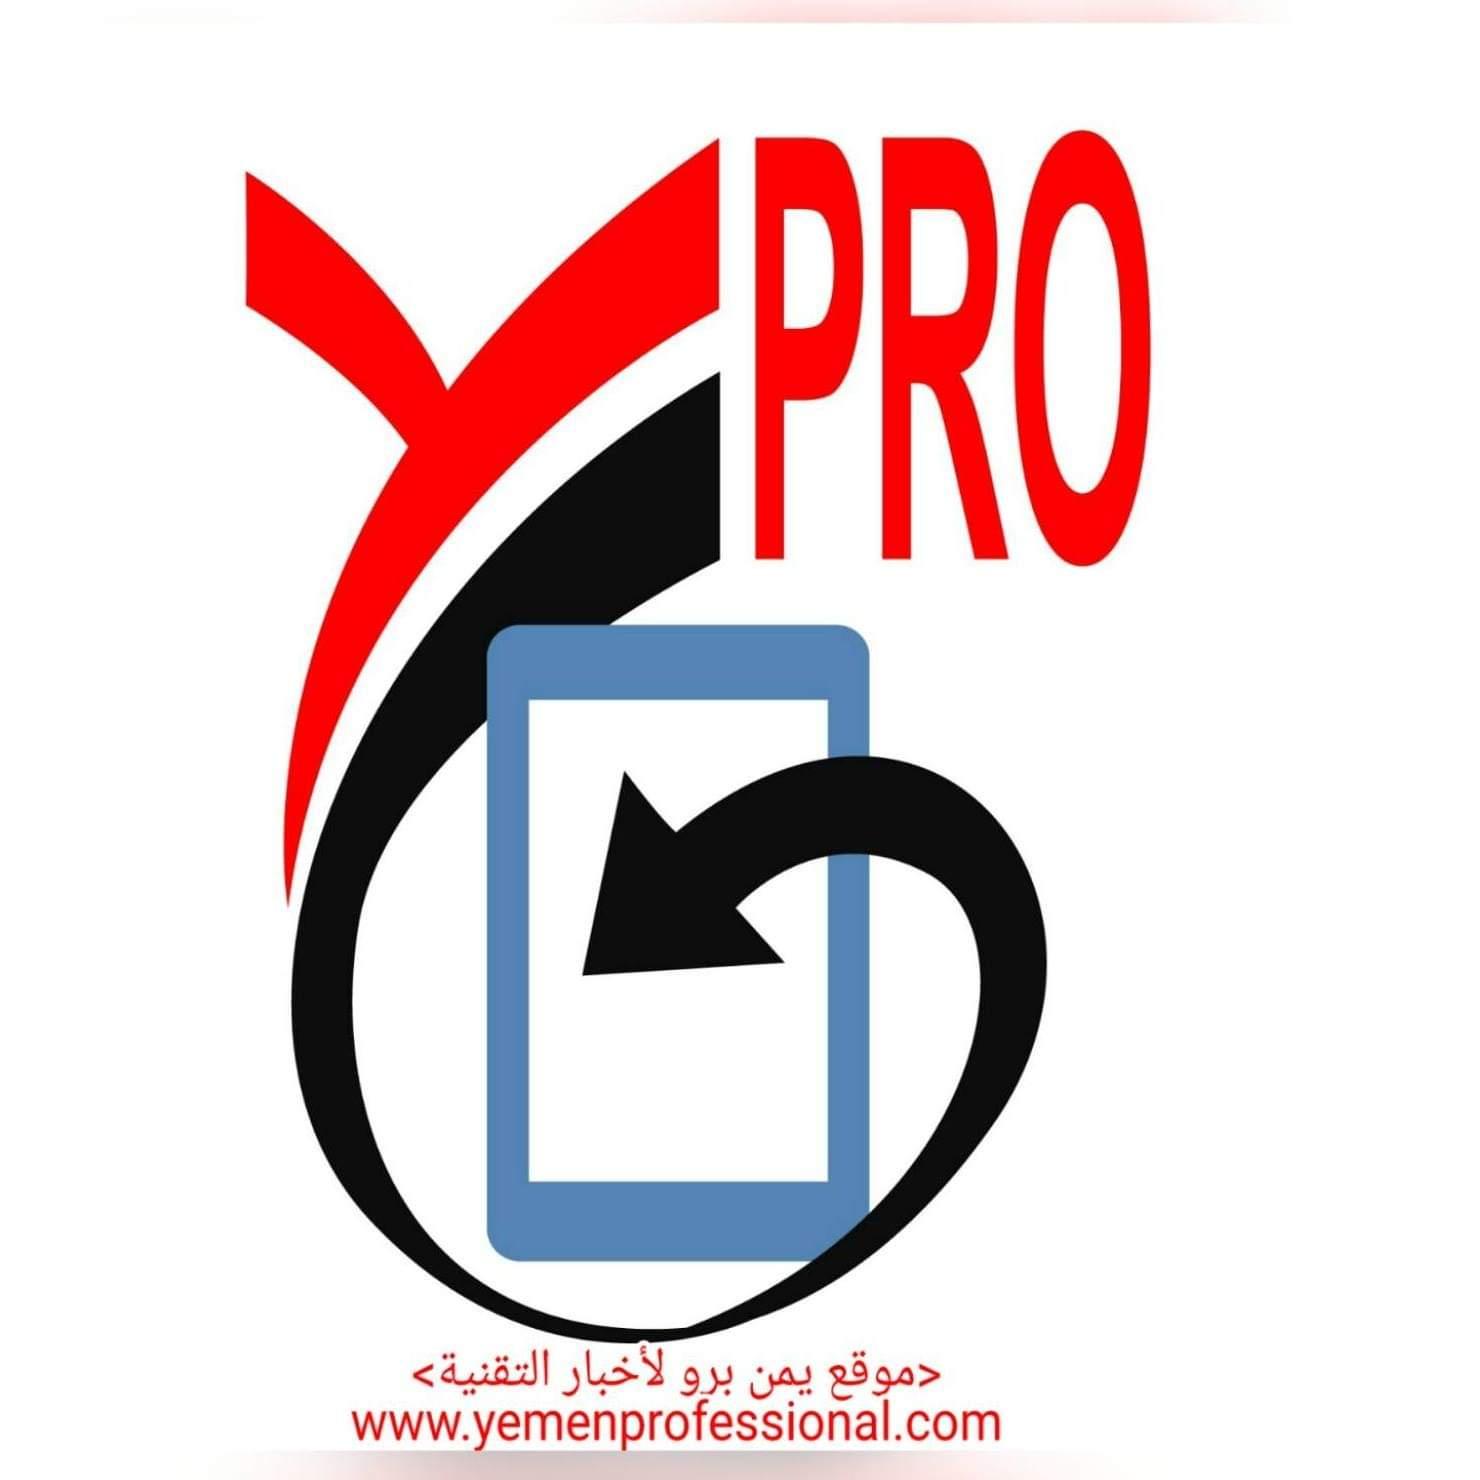 Yemen-Pro